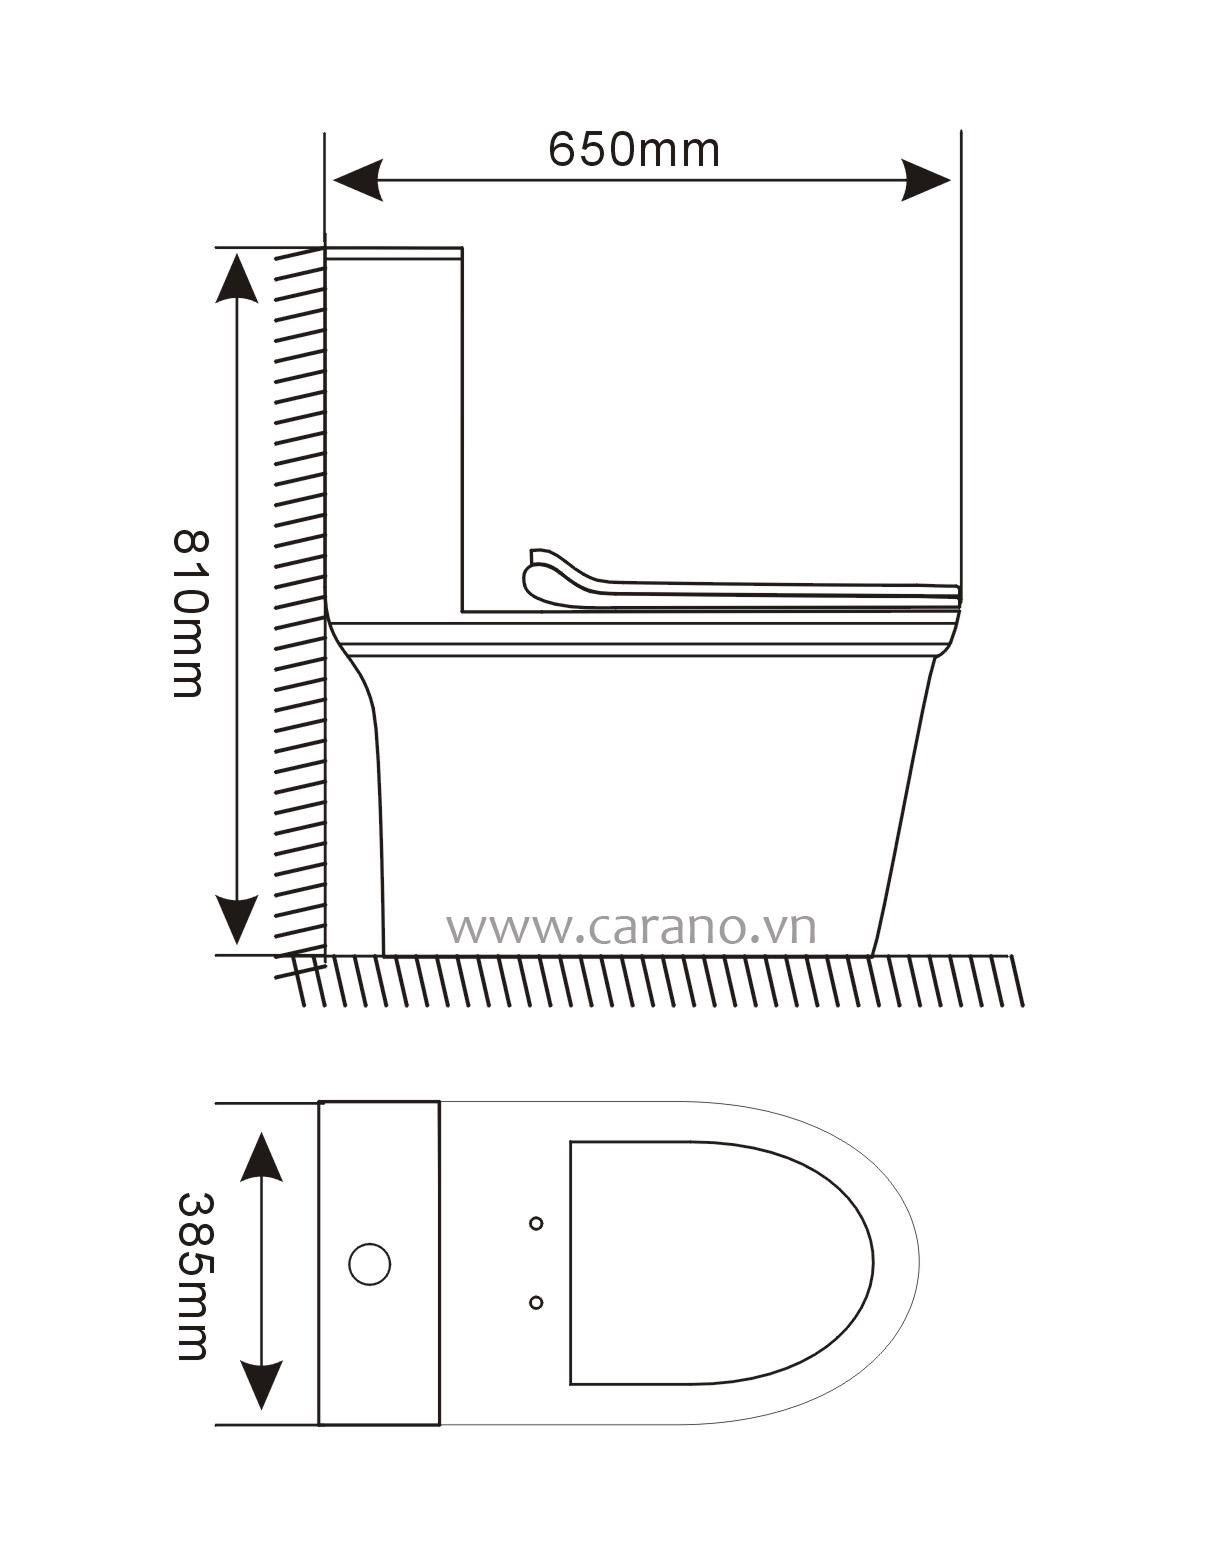 BỒN CẦU CARANO 1 KHỐI K21AS65MD (TOILET MODEL: K21AS65MD)